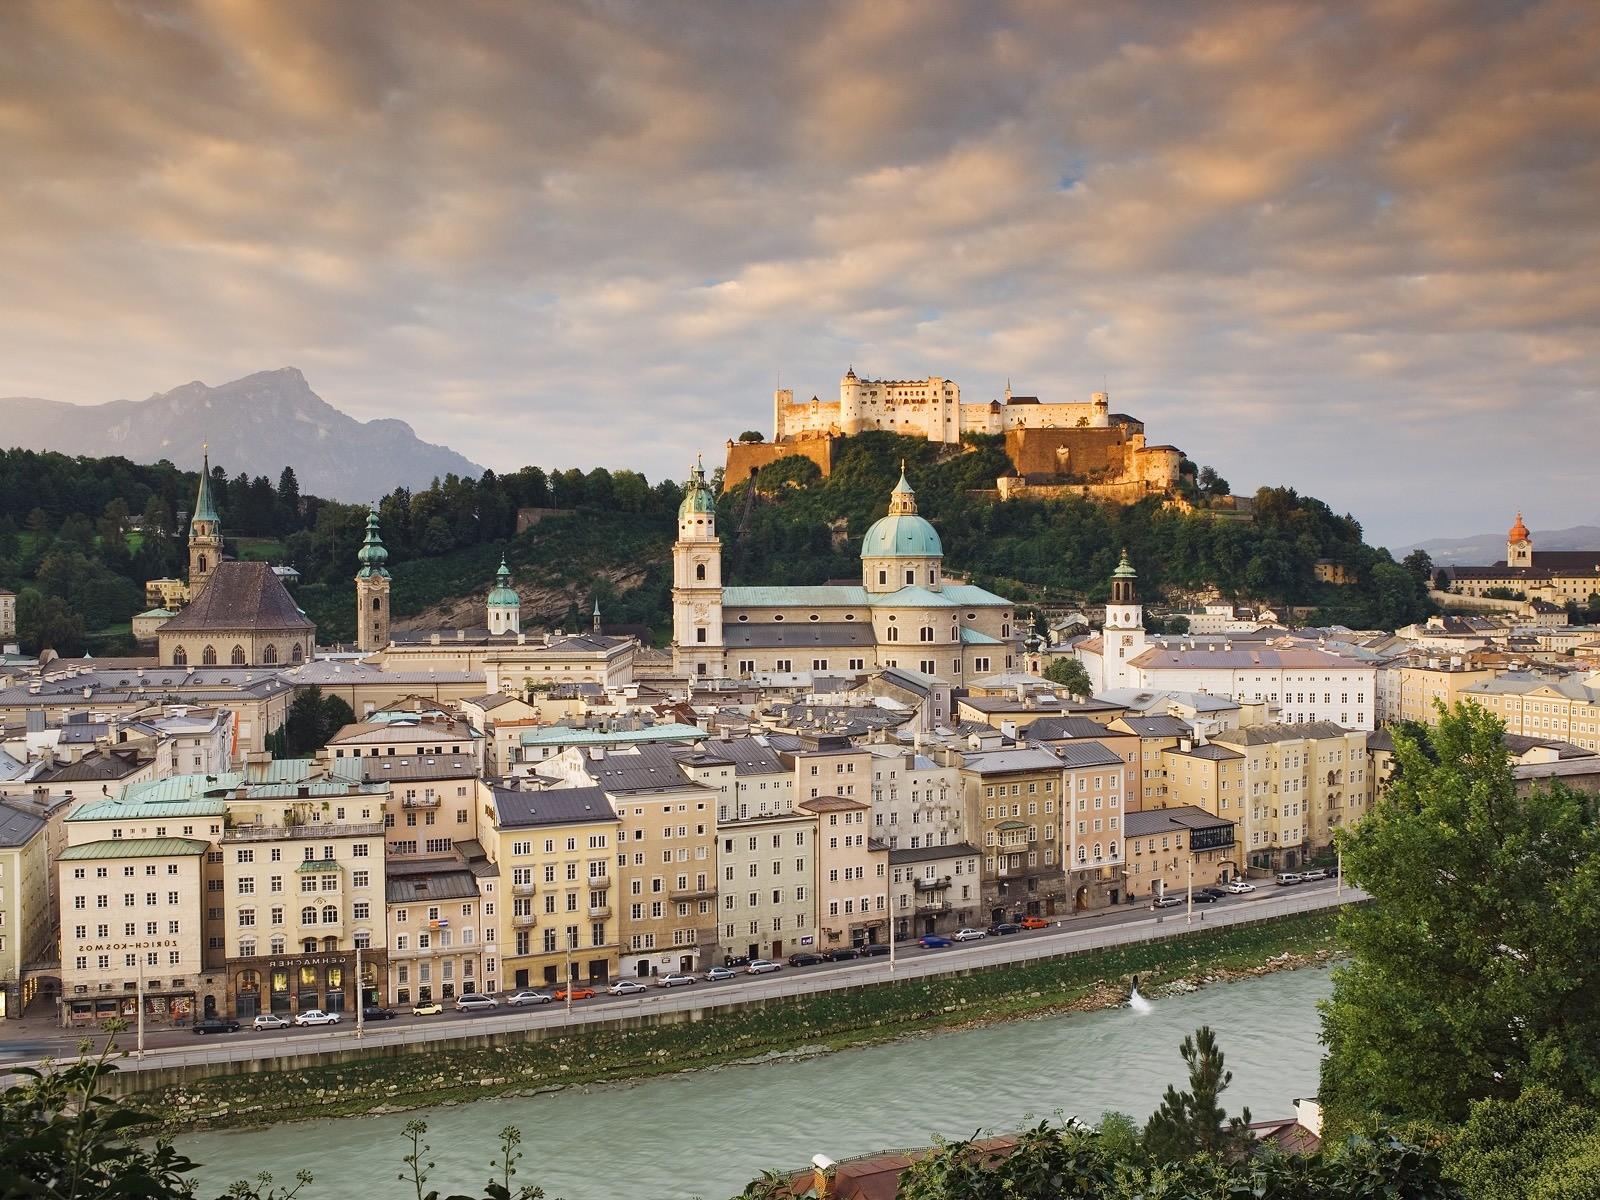 Download Salzburg Austria Wallpaper 43988 [1600x1200] 47 1600x1200